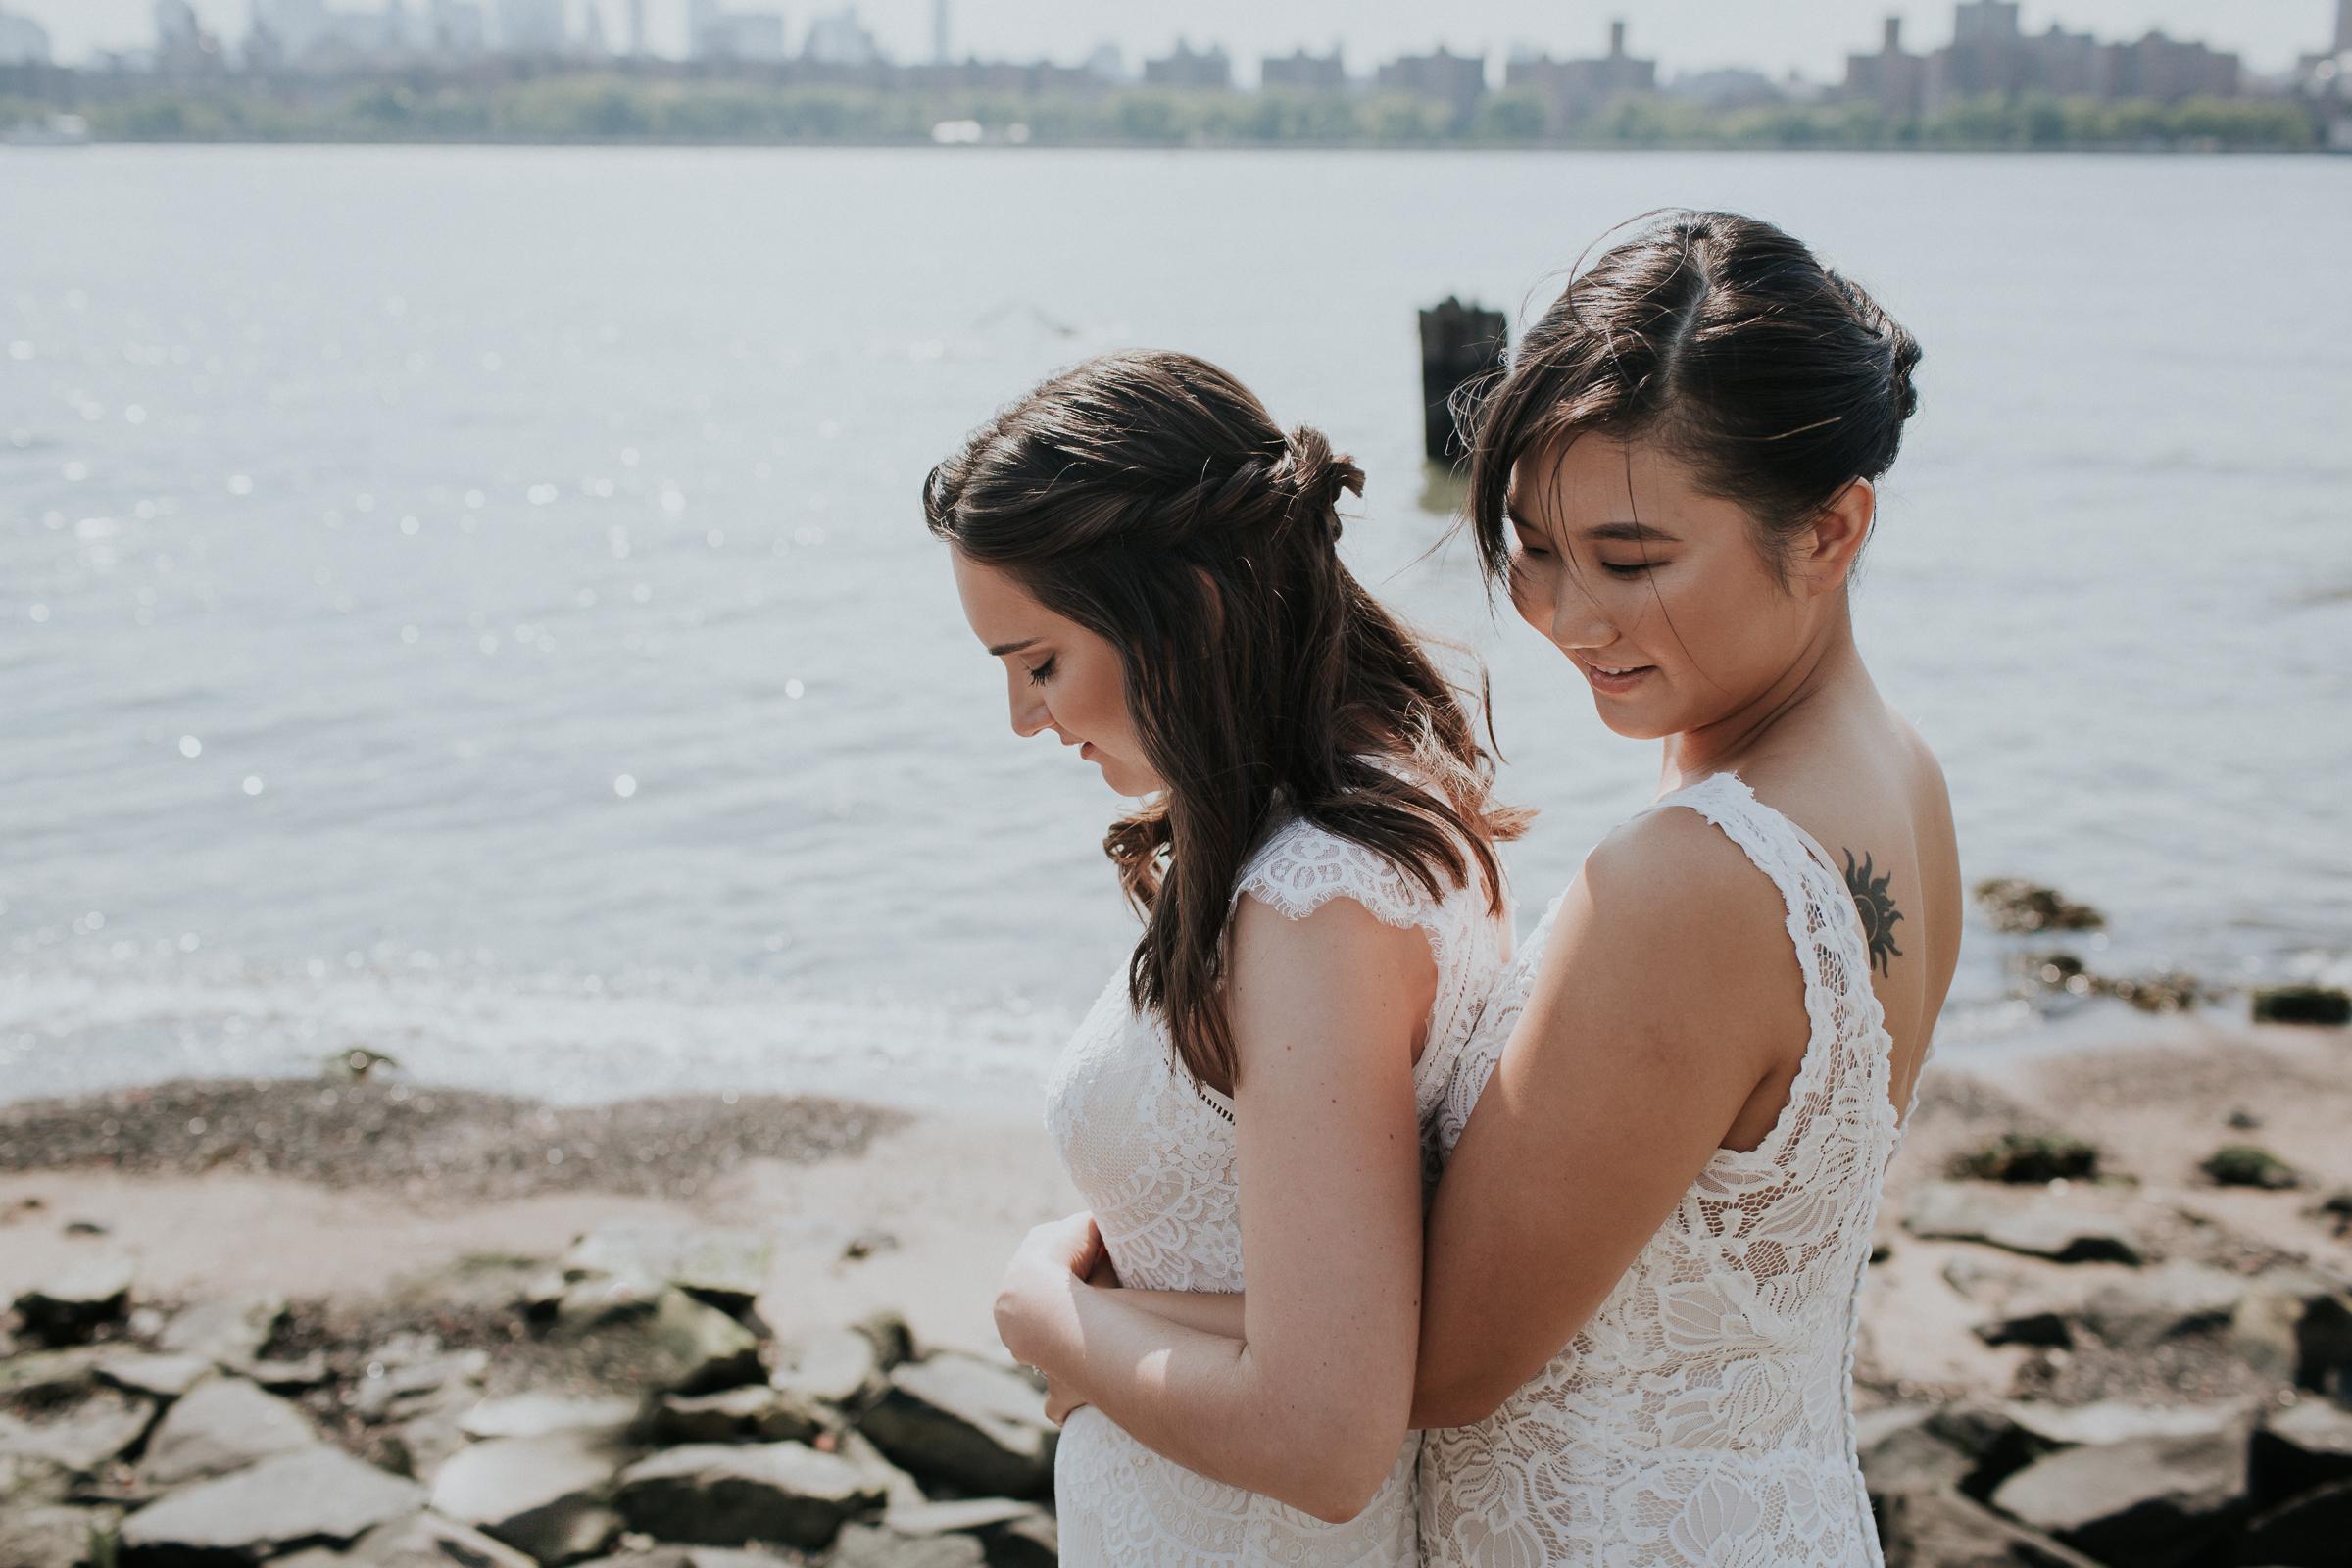 My-Moon-Brooklyn-LGBT-Gay-Documentary-Wedding-Photographer-36.jpg